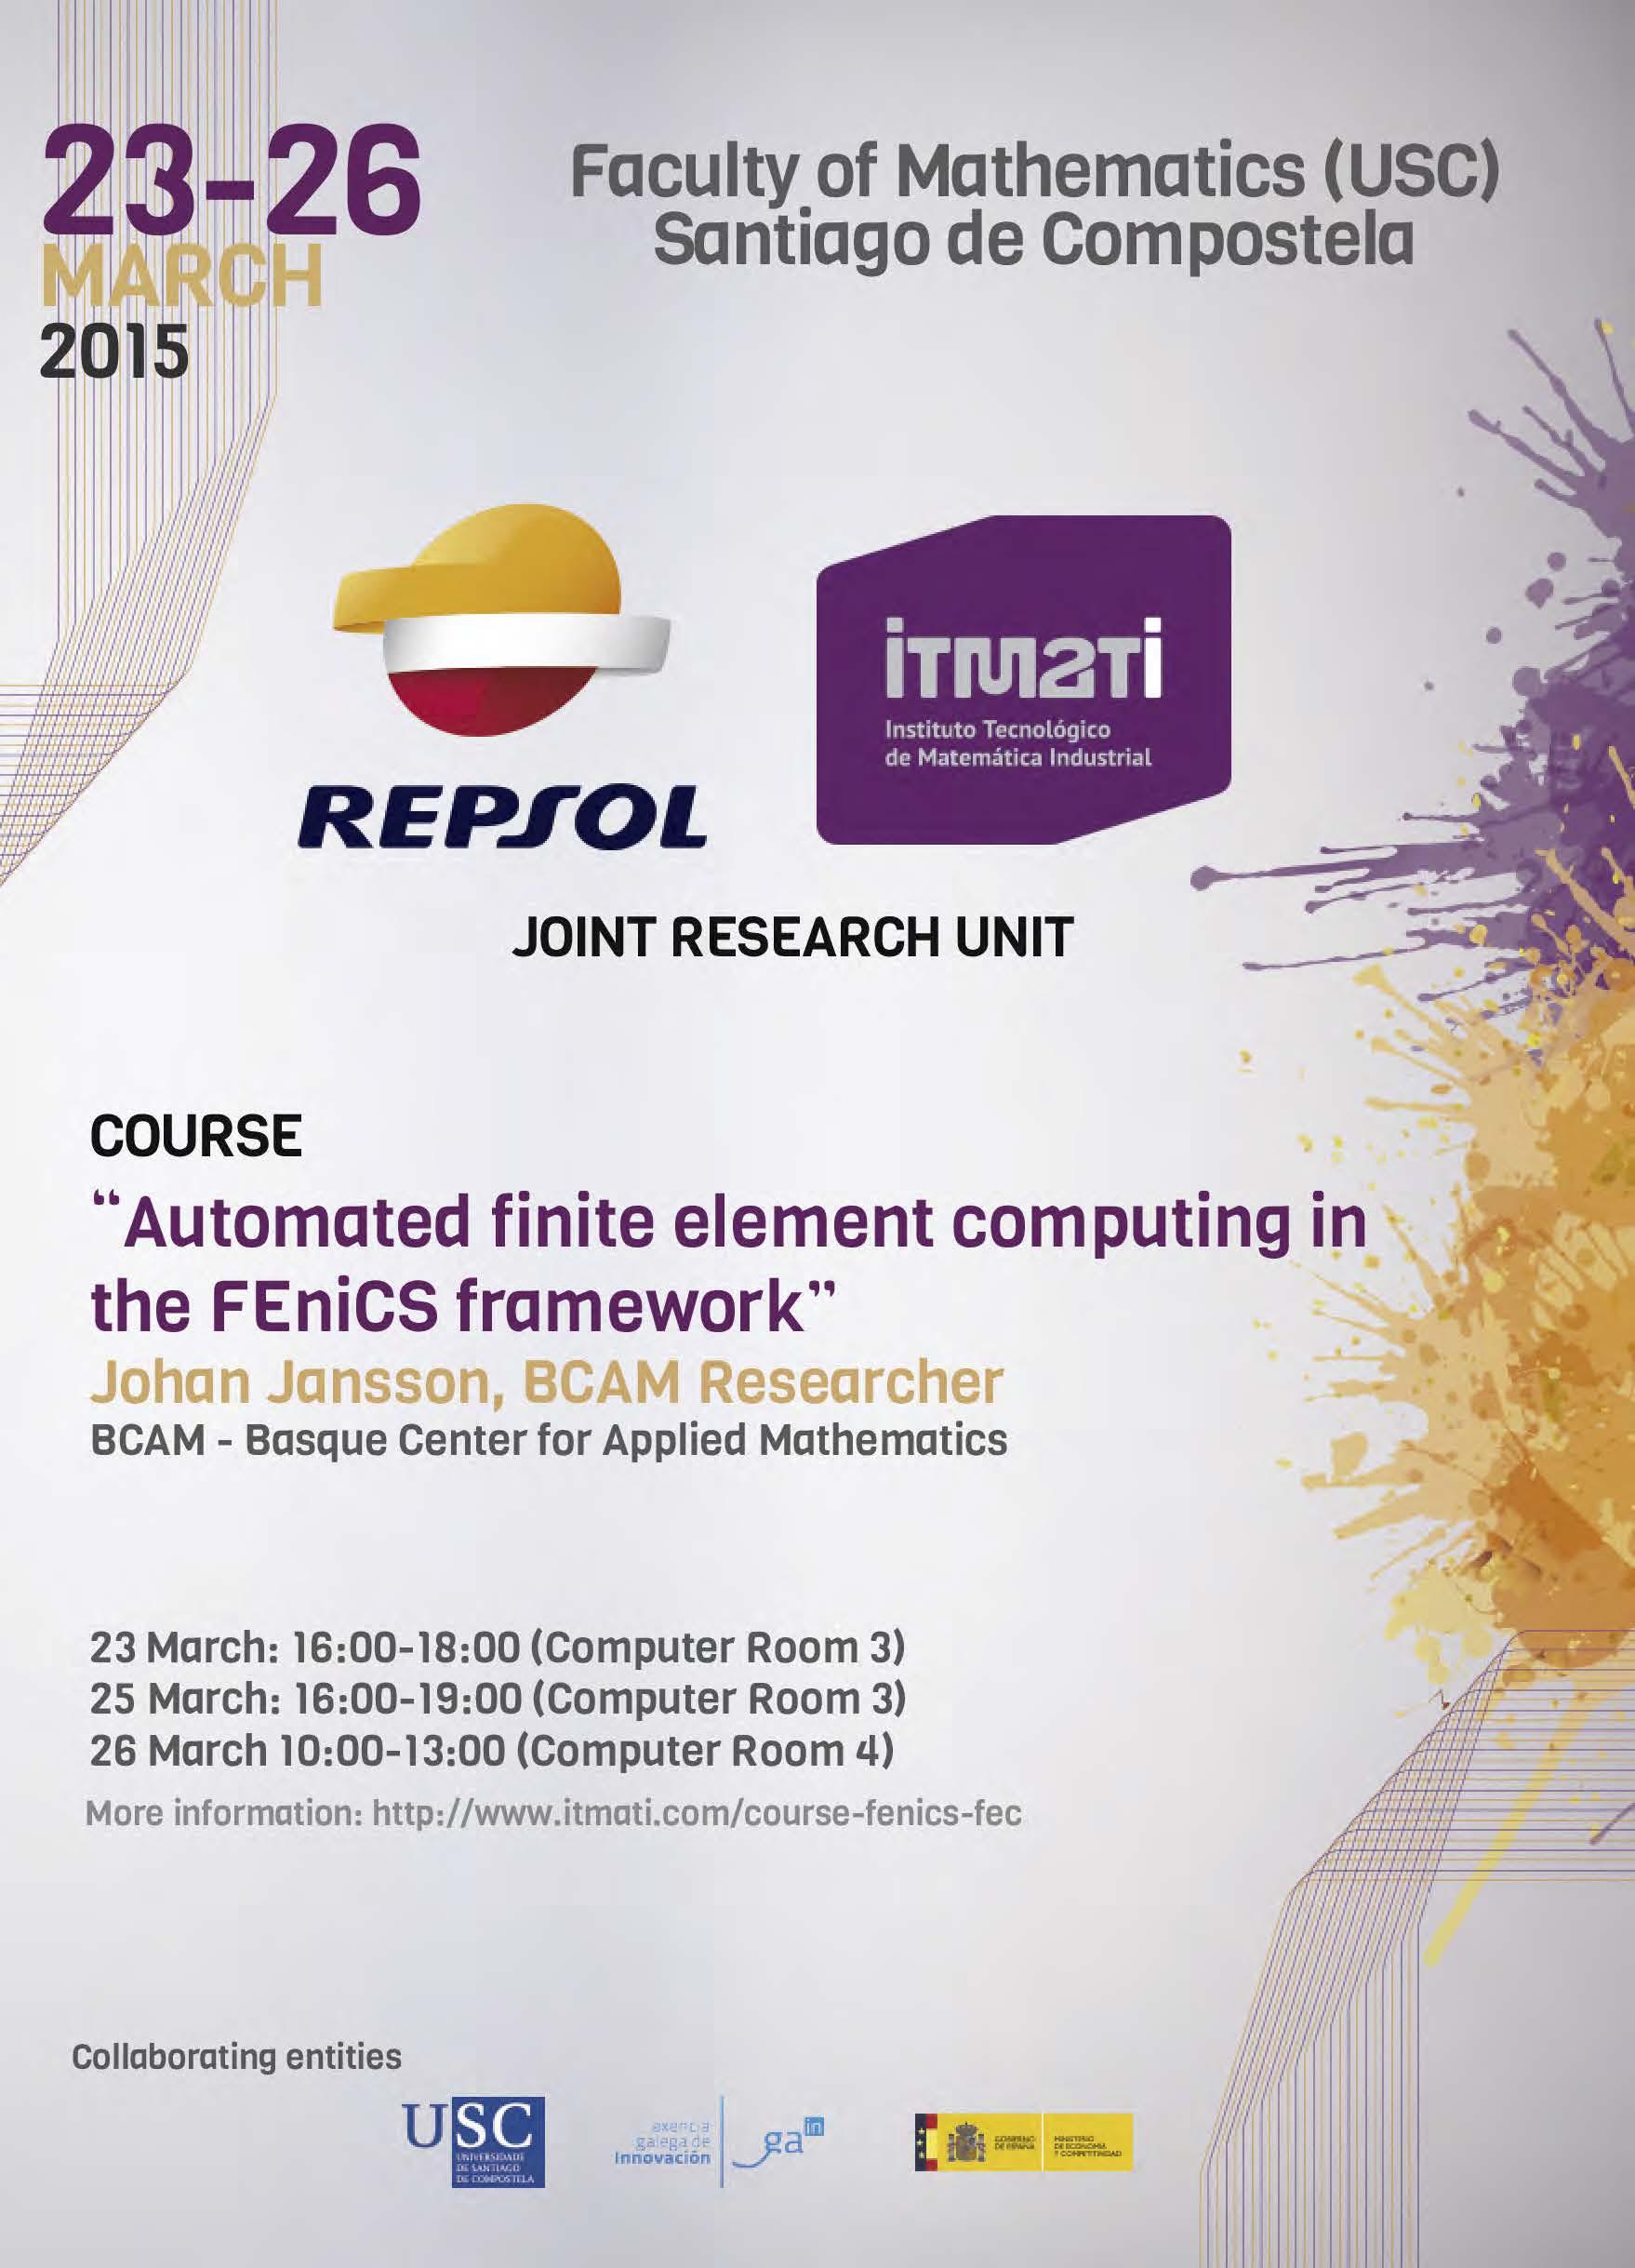 itmati, fenics, matematica industrial, computing